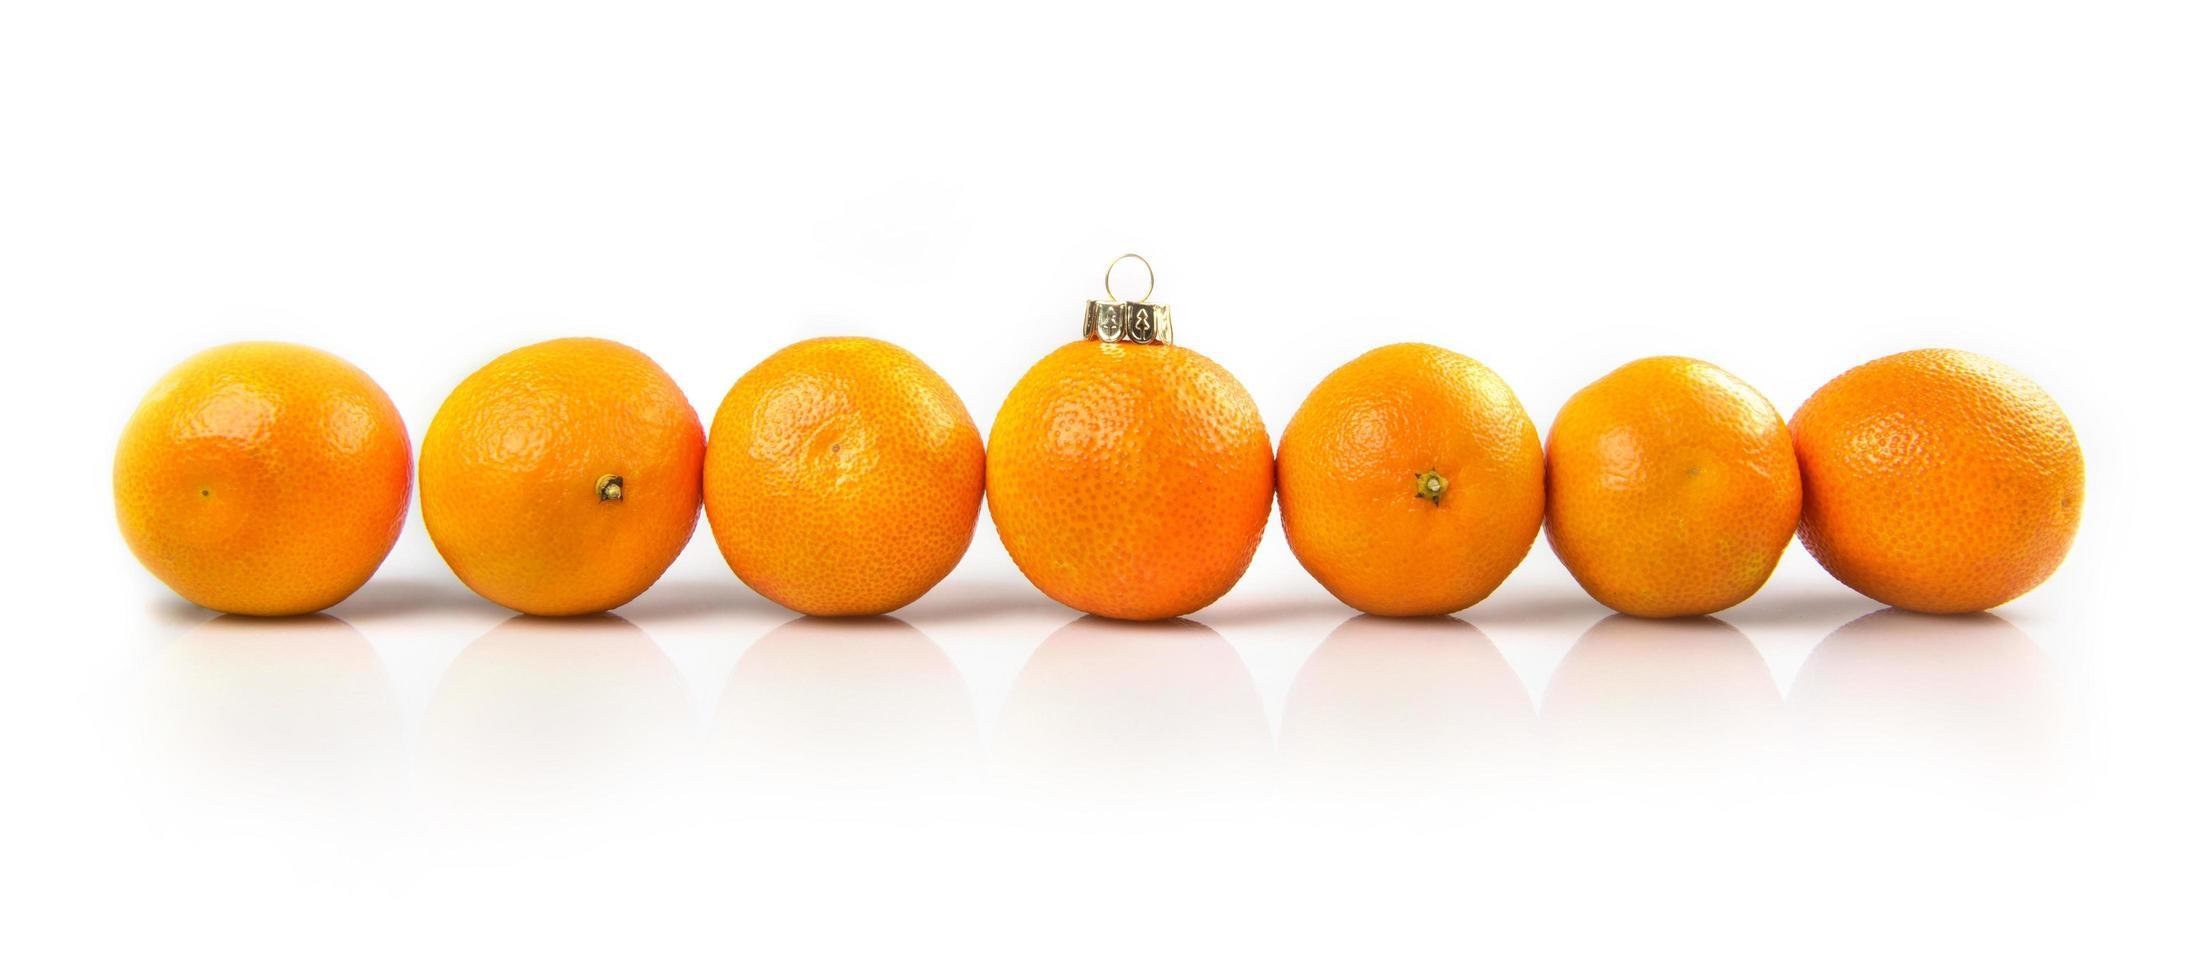 palline di mandarino su uno sfondo bianco foto